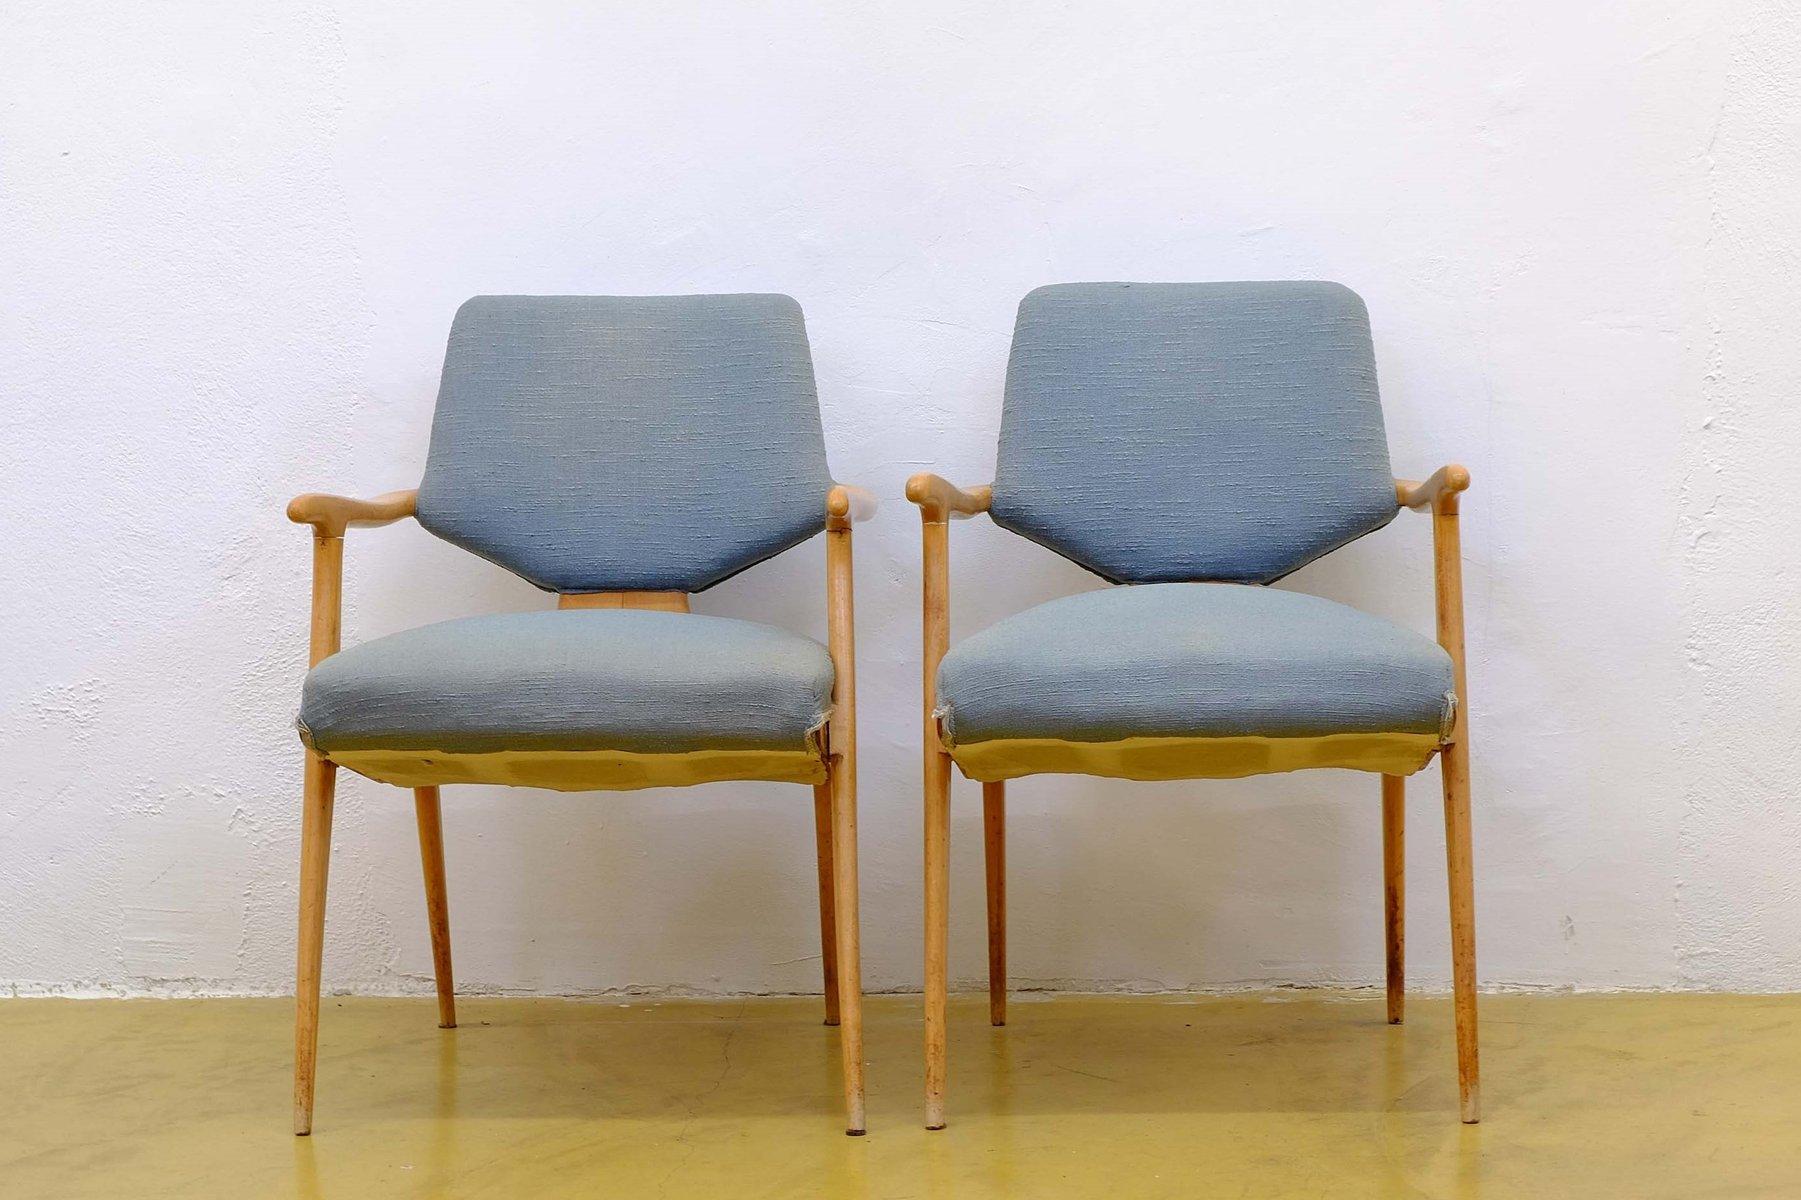 italienische mid century ahorn sessel 2er set bei pamono. Black Bedroom Furniture Sets. Home Design Ideas